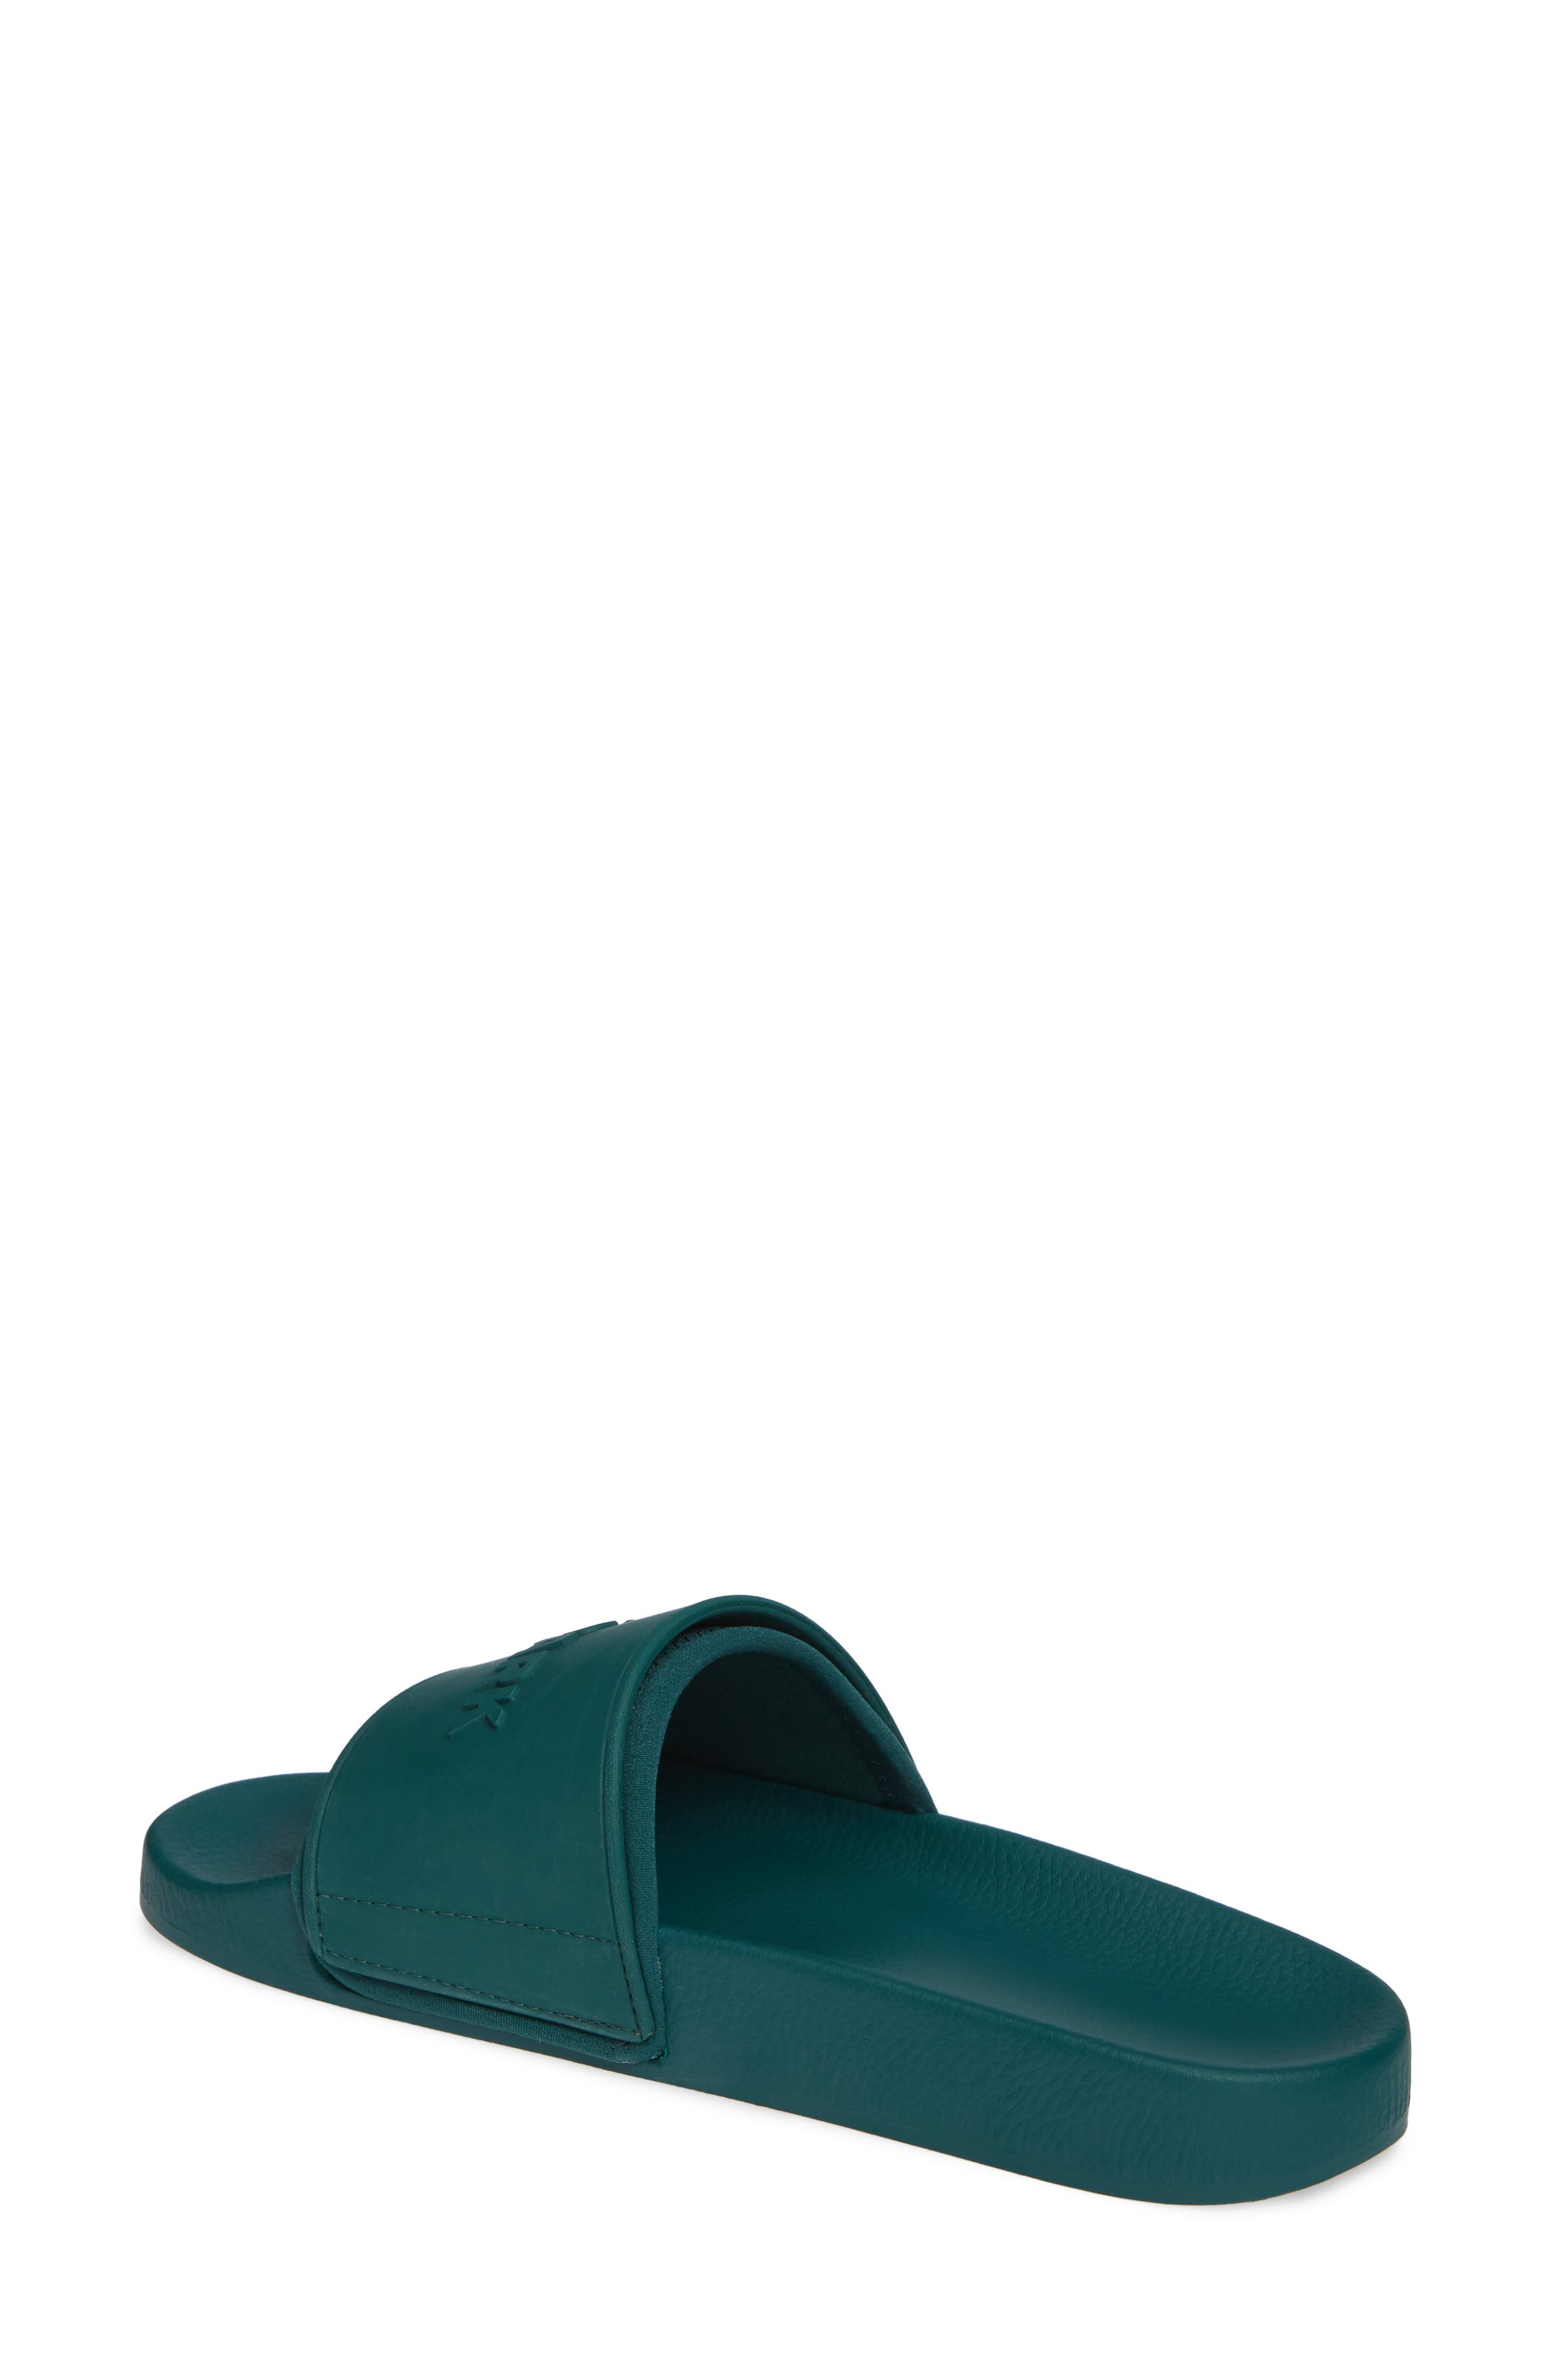 IVY PARK<SUP>®</SUP>, Embossed Logo Slide Sandal, Alternate thumbnail 2, color, 300